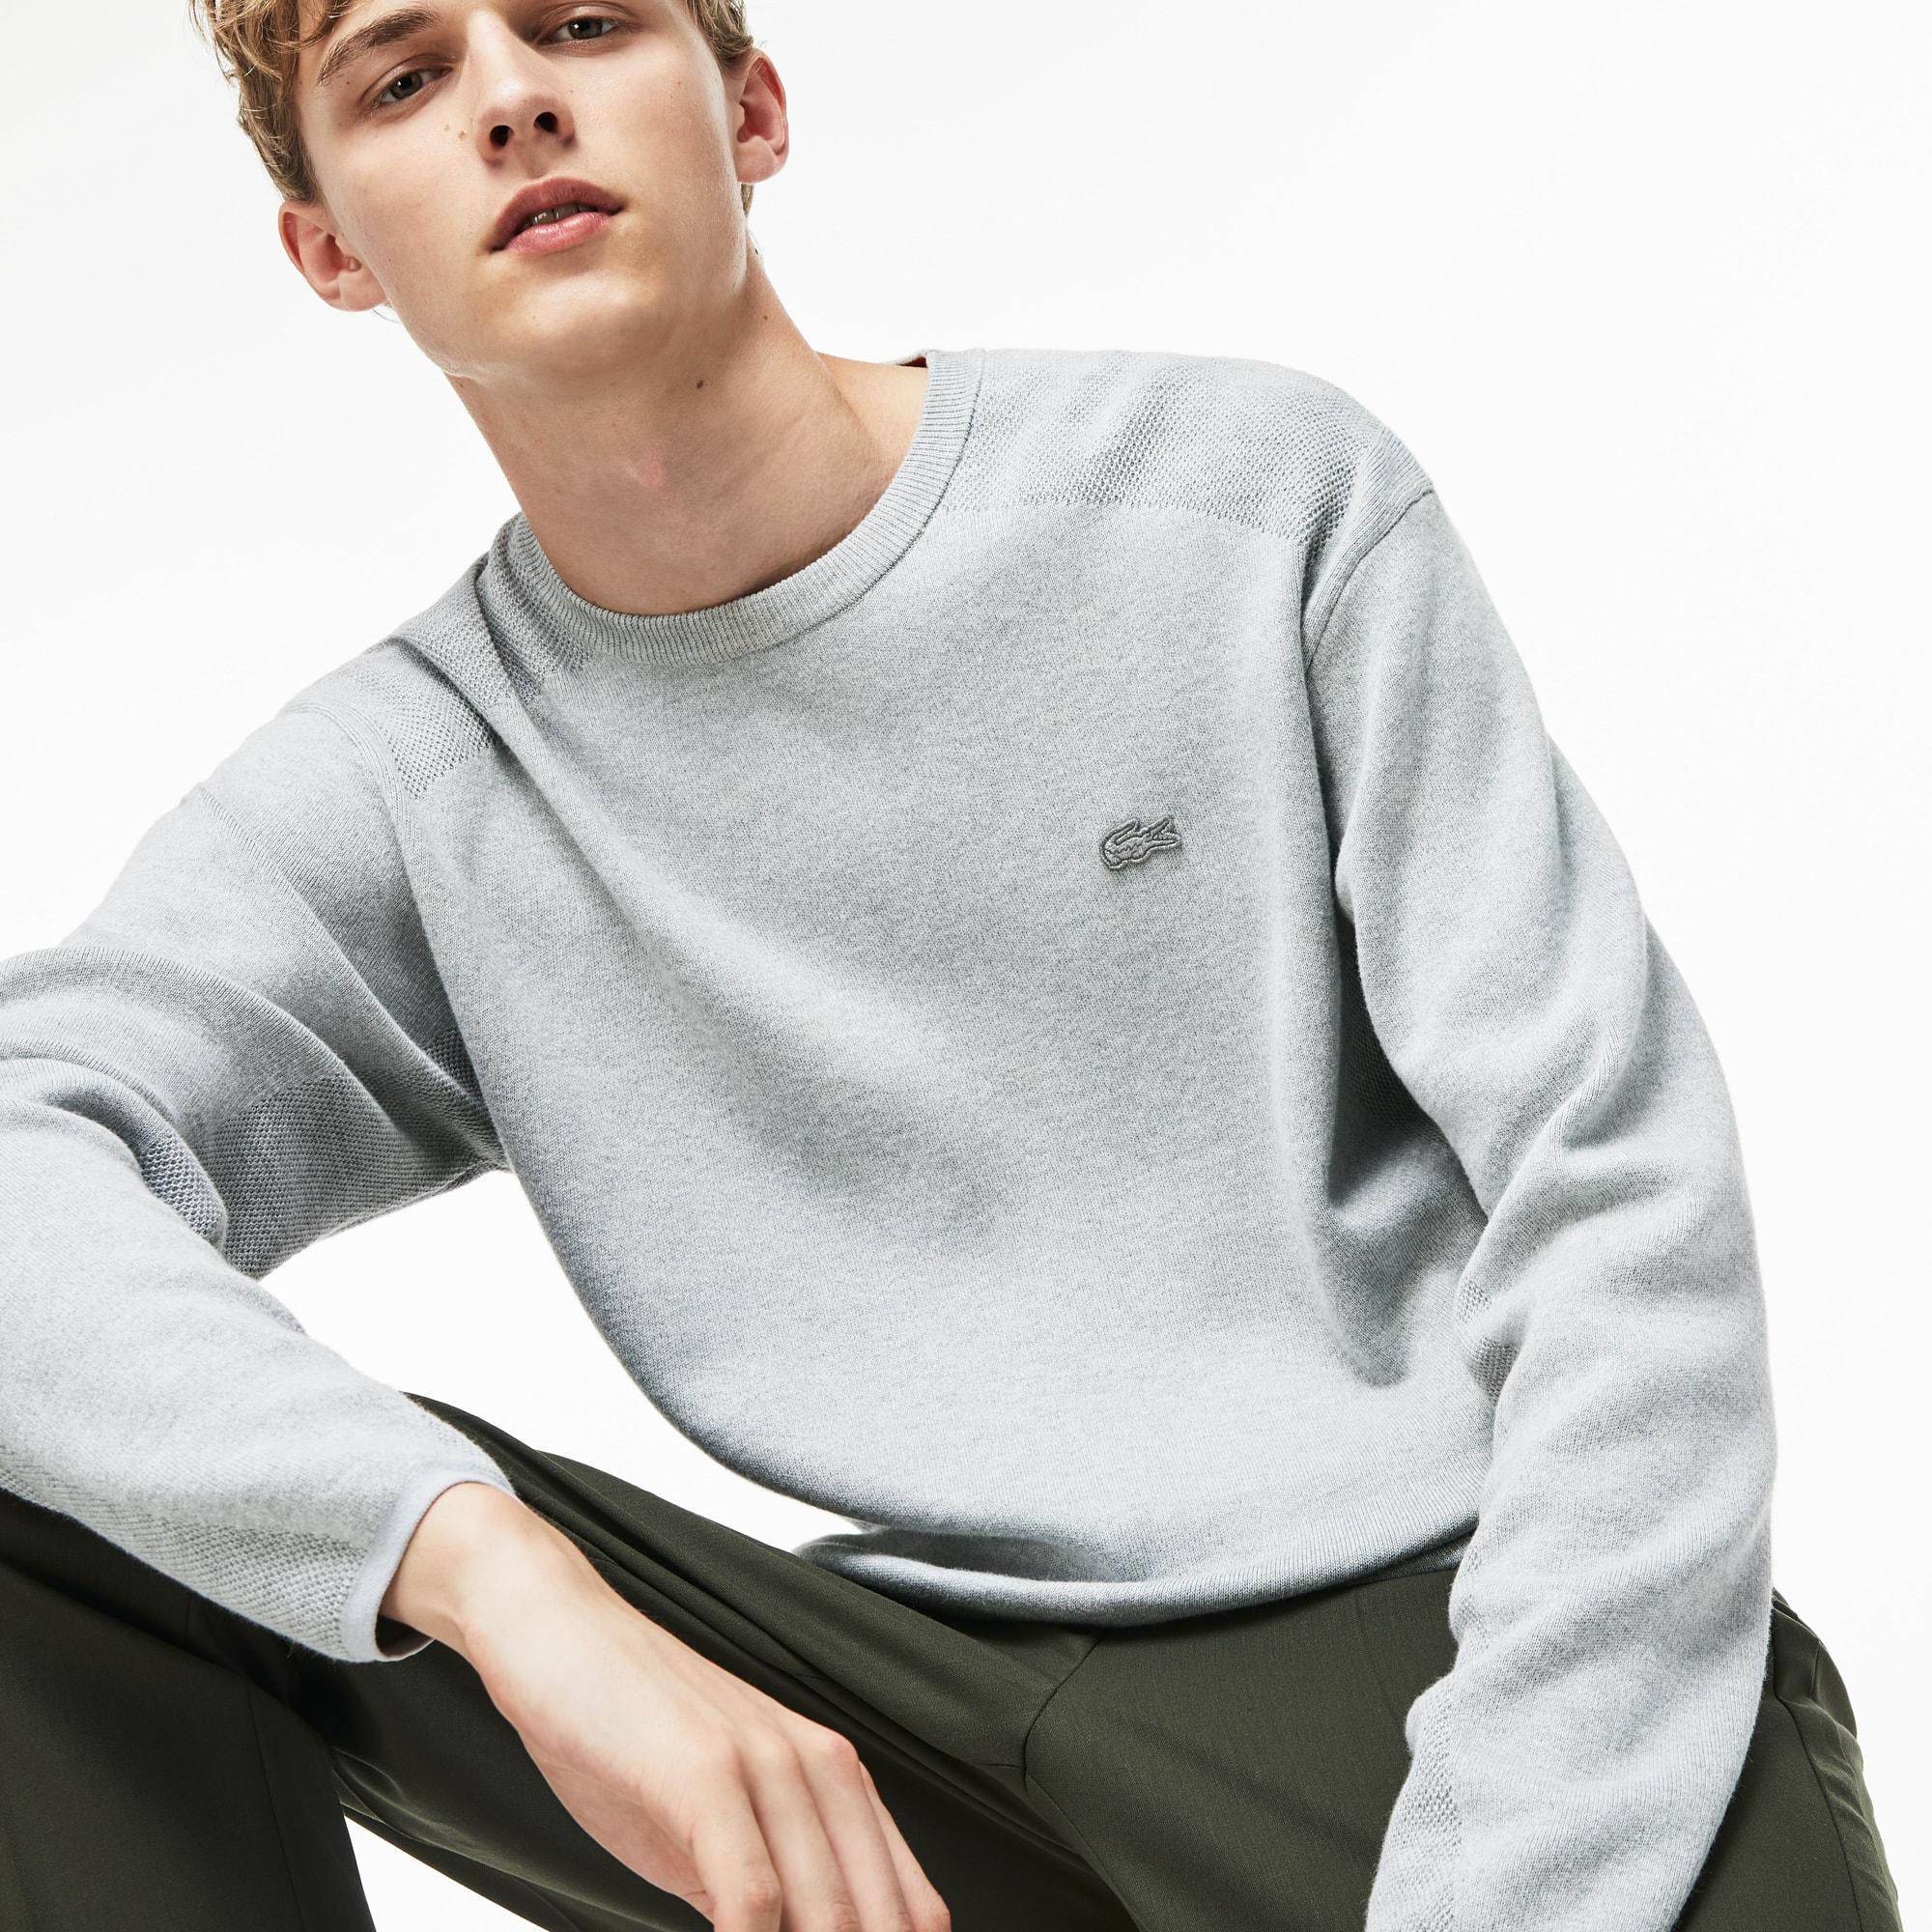 Herren LACOSTE MOTION Baumwoll-Sweatshirt